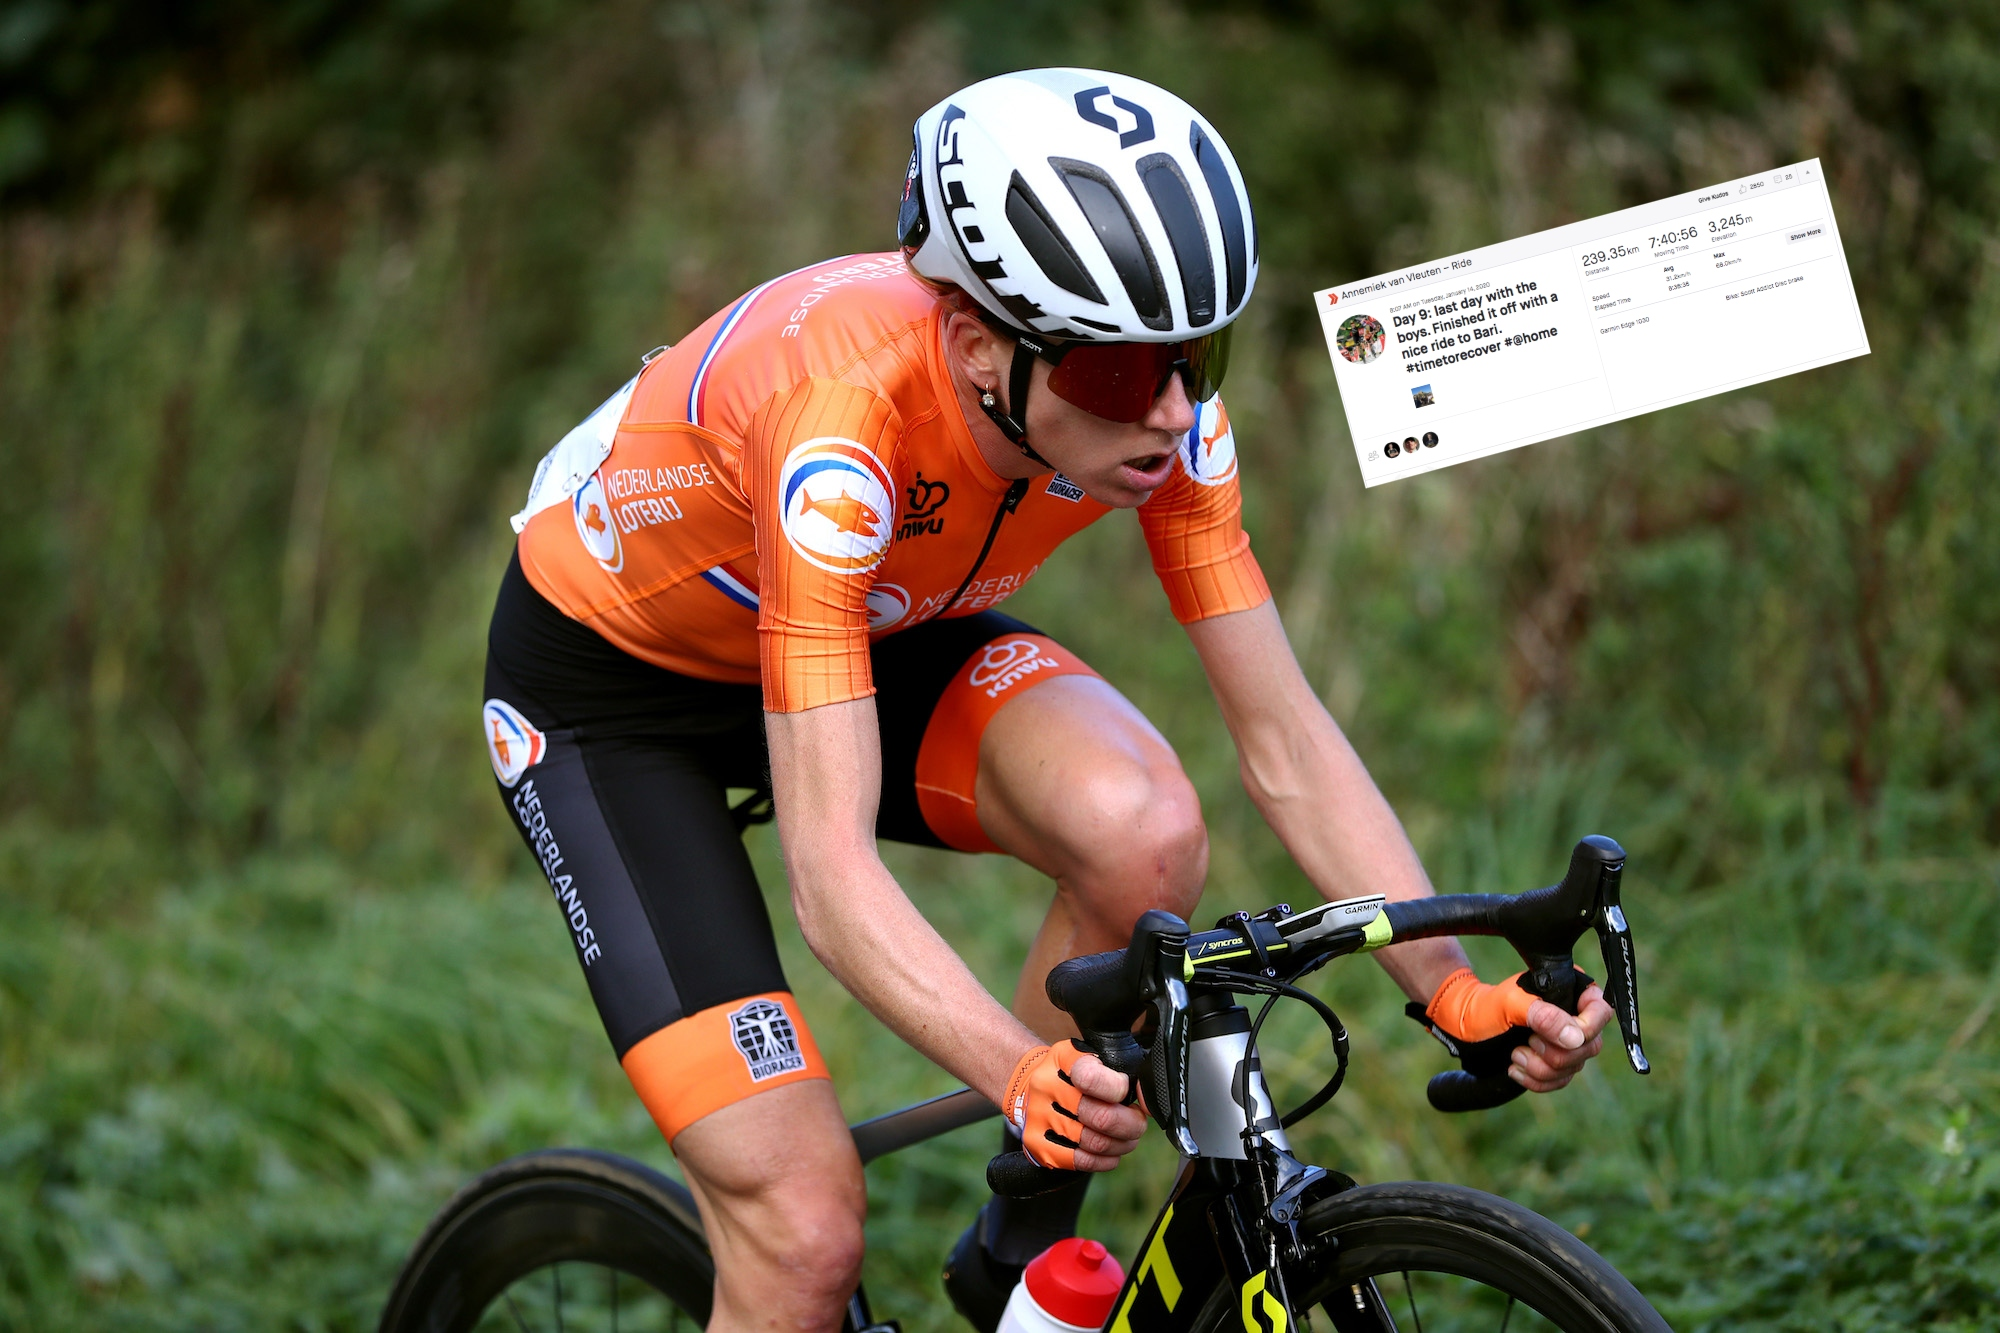 Egan Bernal and Annemiek van Vleuten top the leaderboard for most training kilometres on Strava